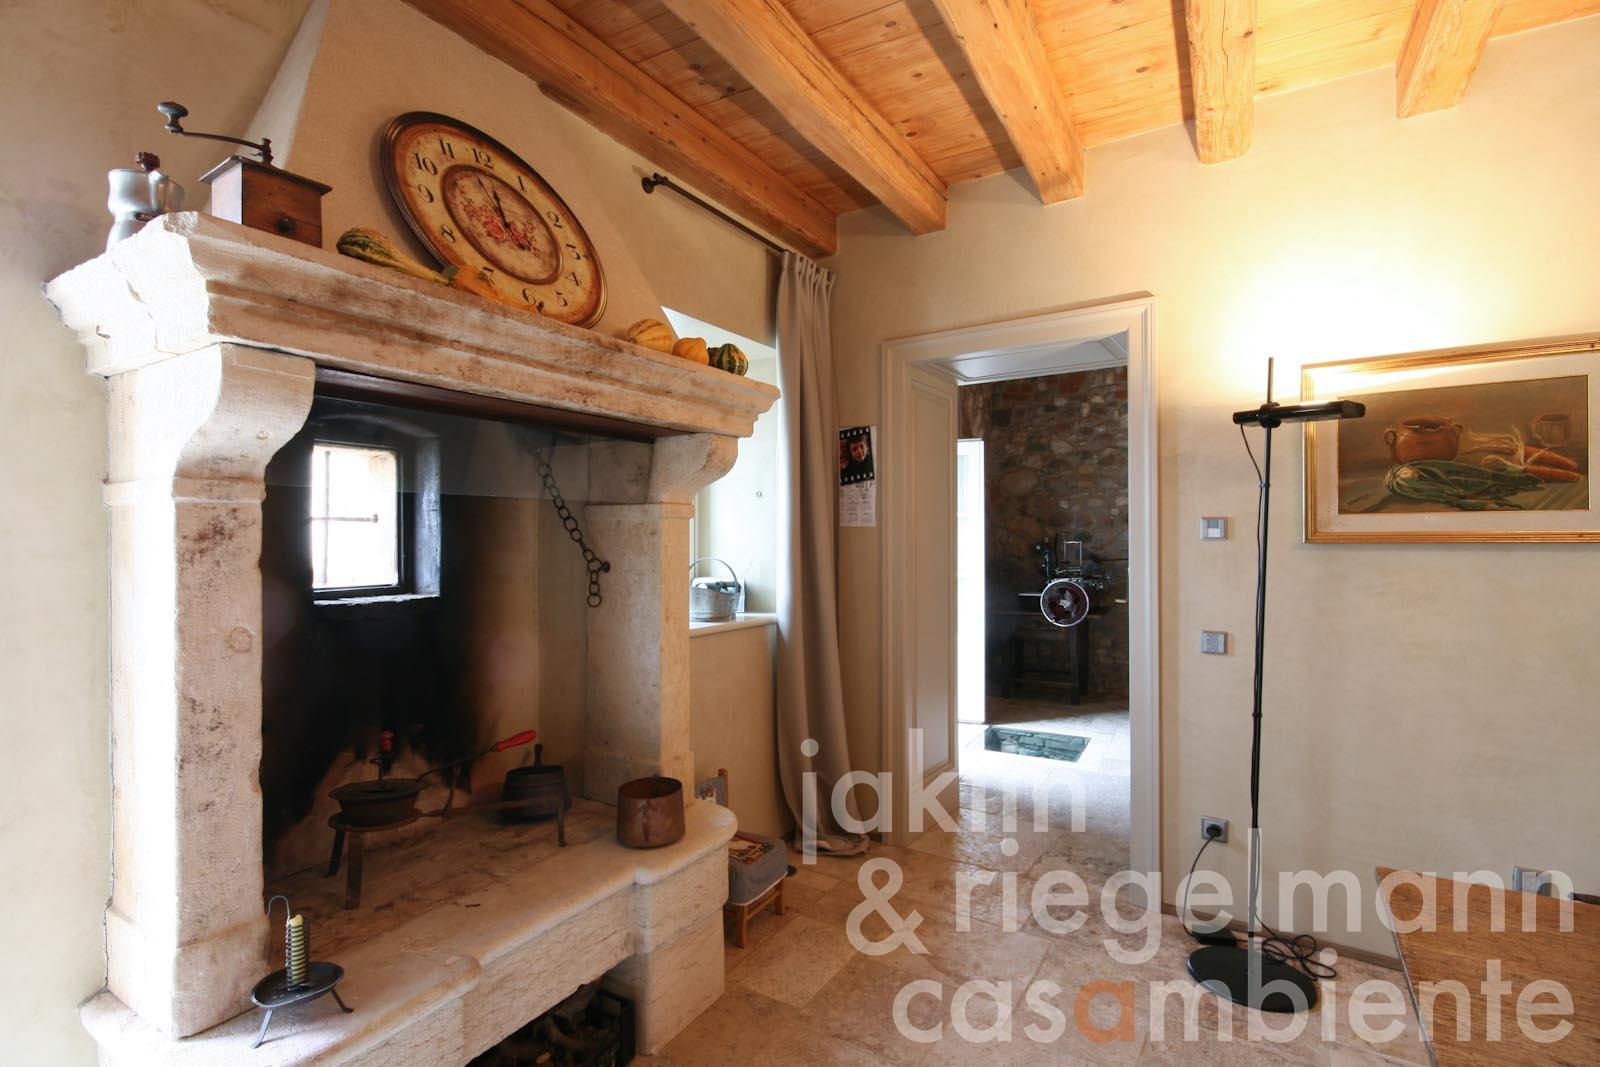 Landsitz kaufen verkaufen in Italien, Venetien, Verona, Hochwertige ...